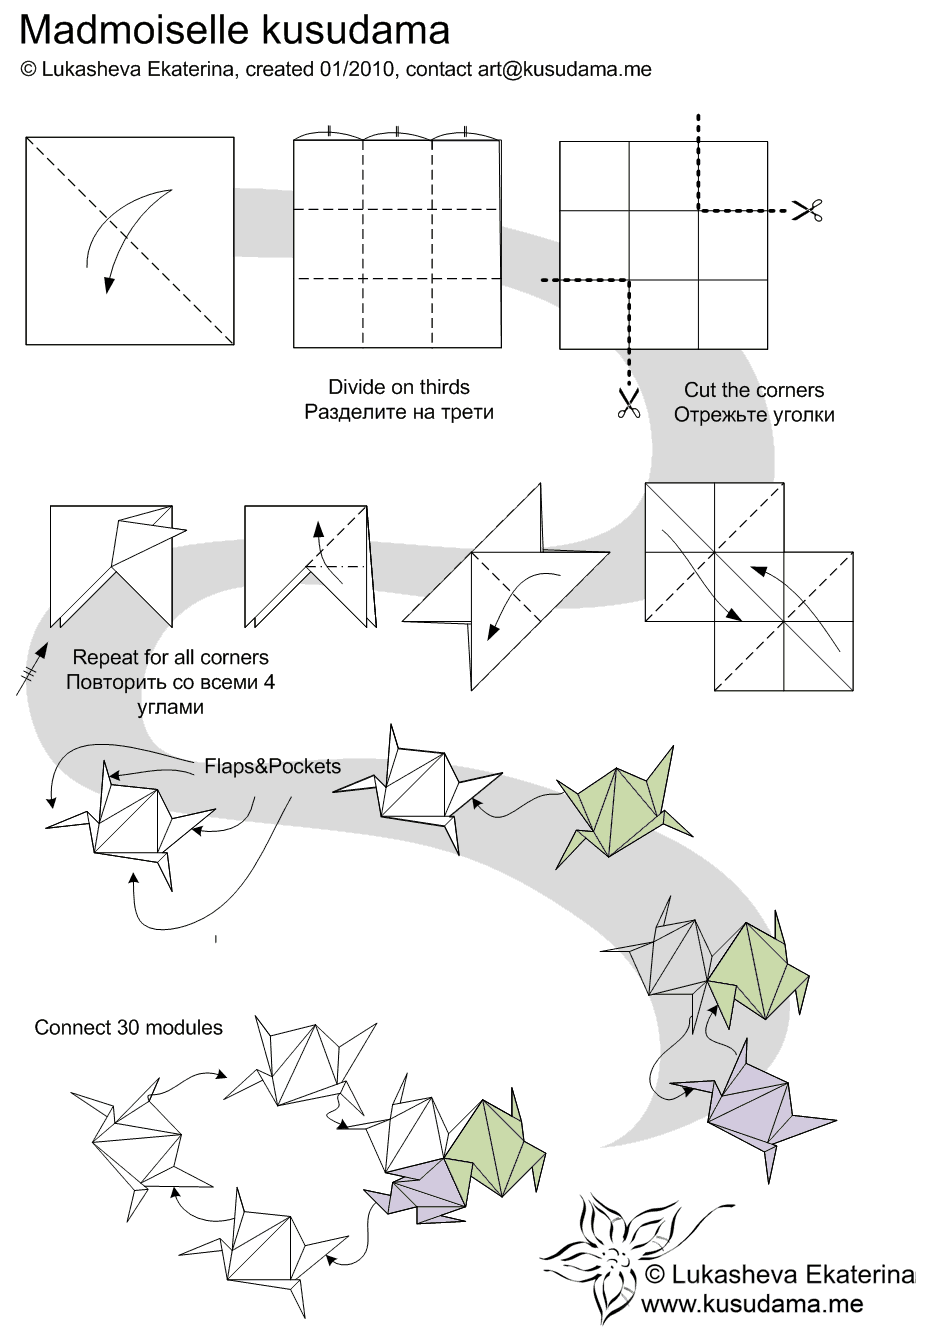 460bd0e6a5184cb25b7c00344e9b3068 diagram for radianta whirl kusudama wedding pinterest modular origami diagrams at gsmportal.co